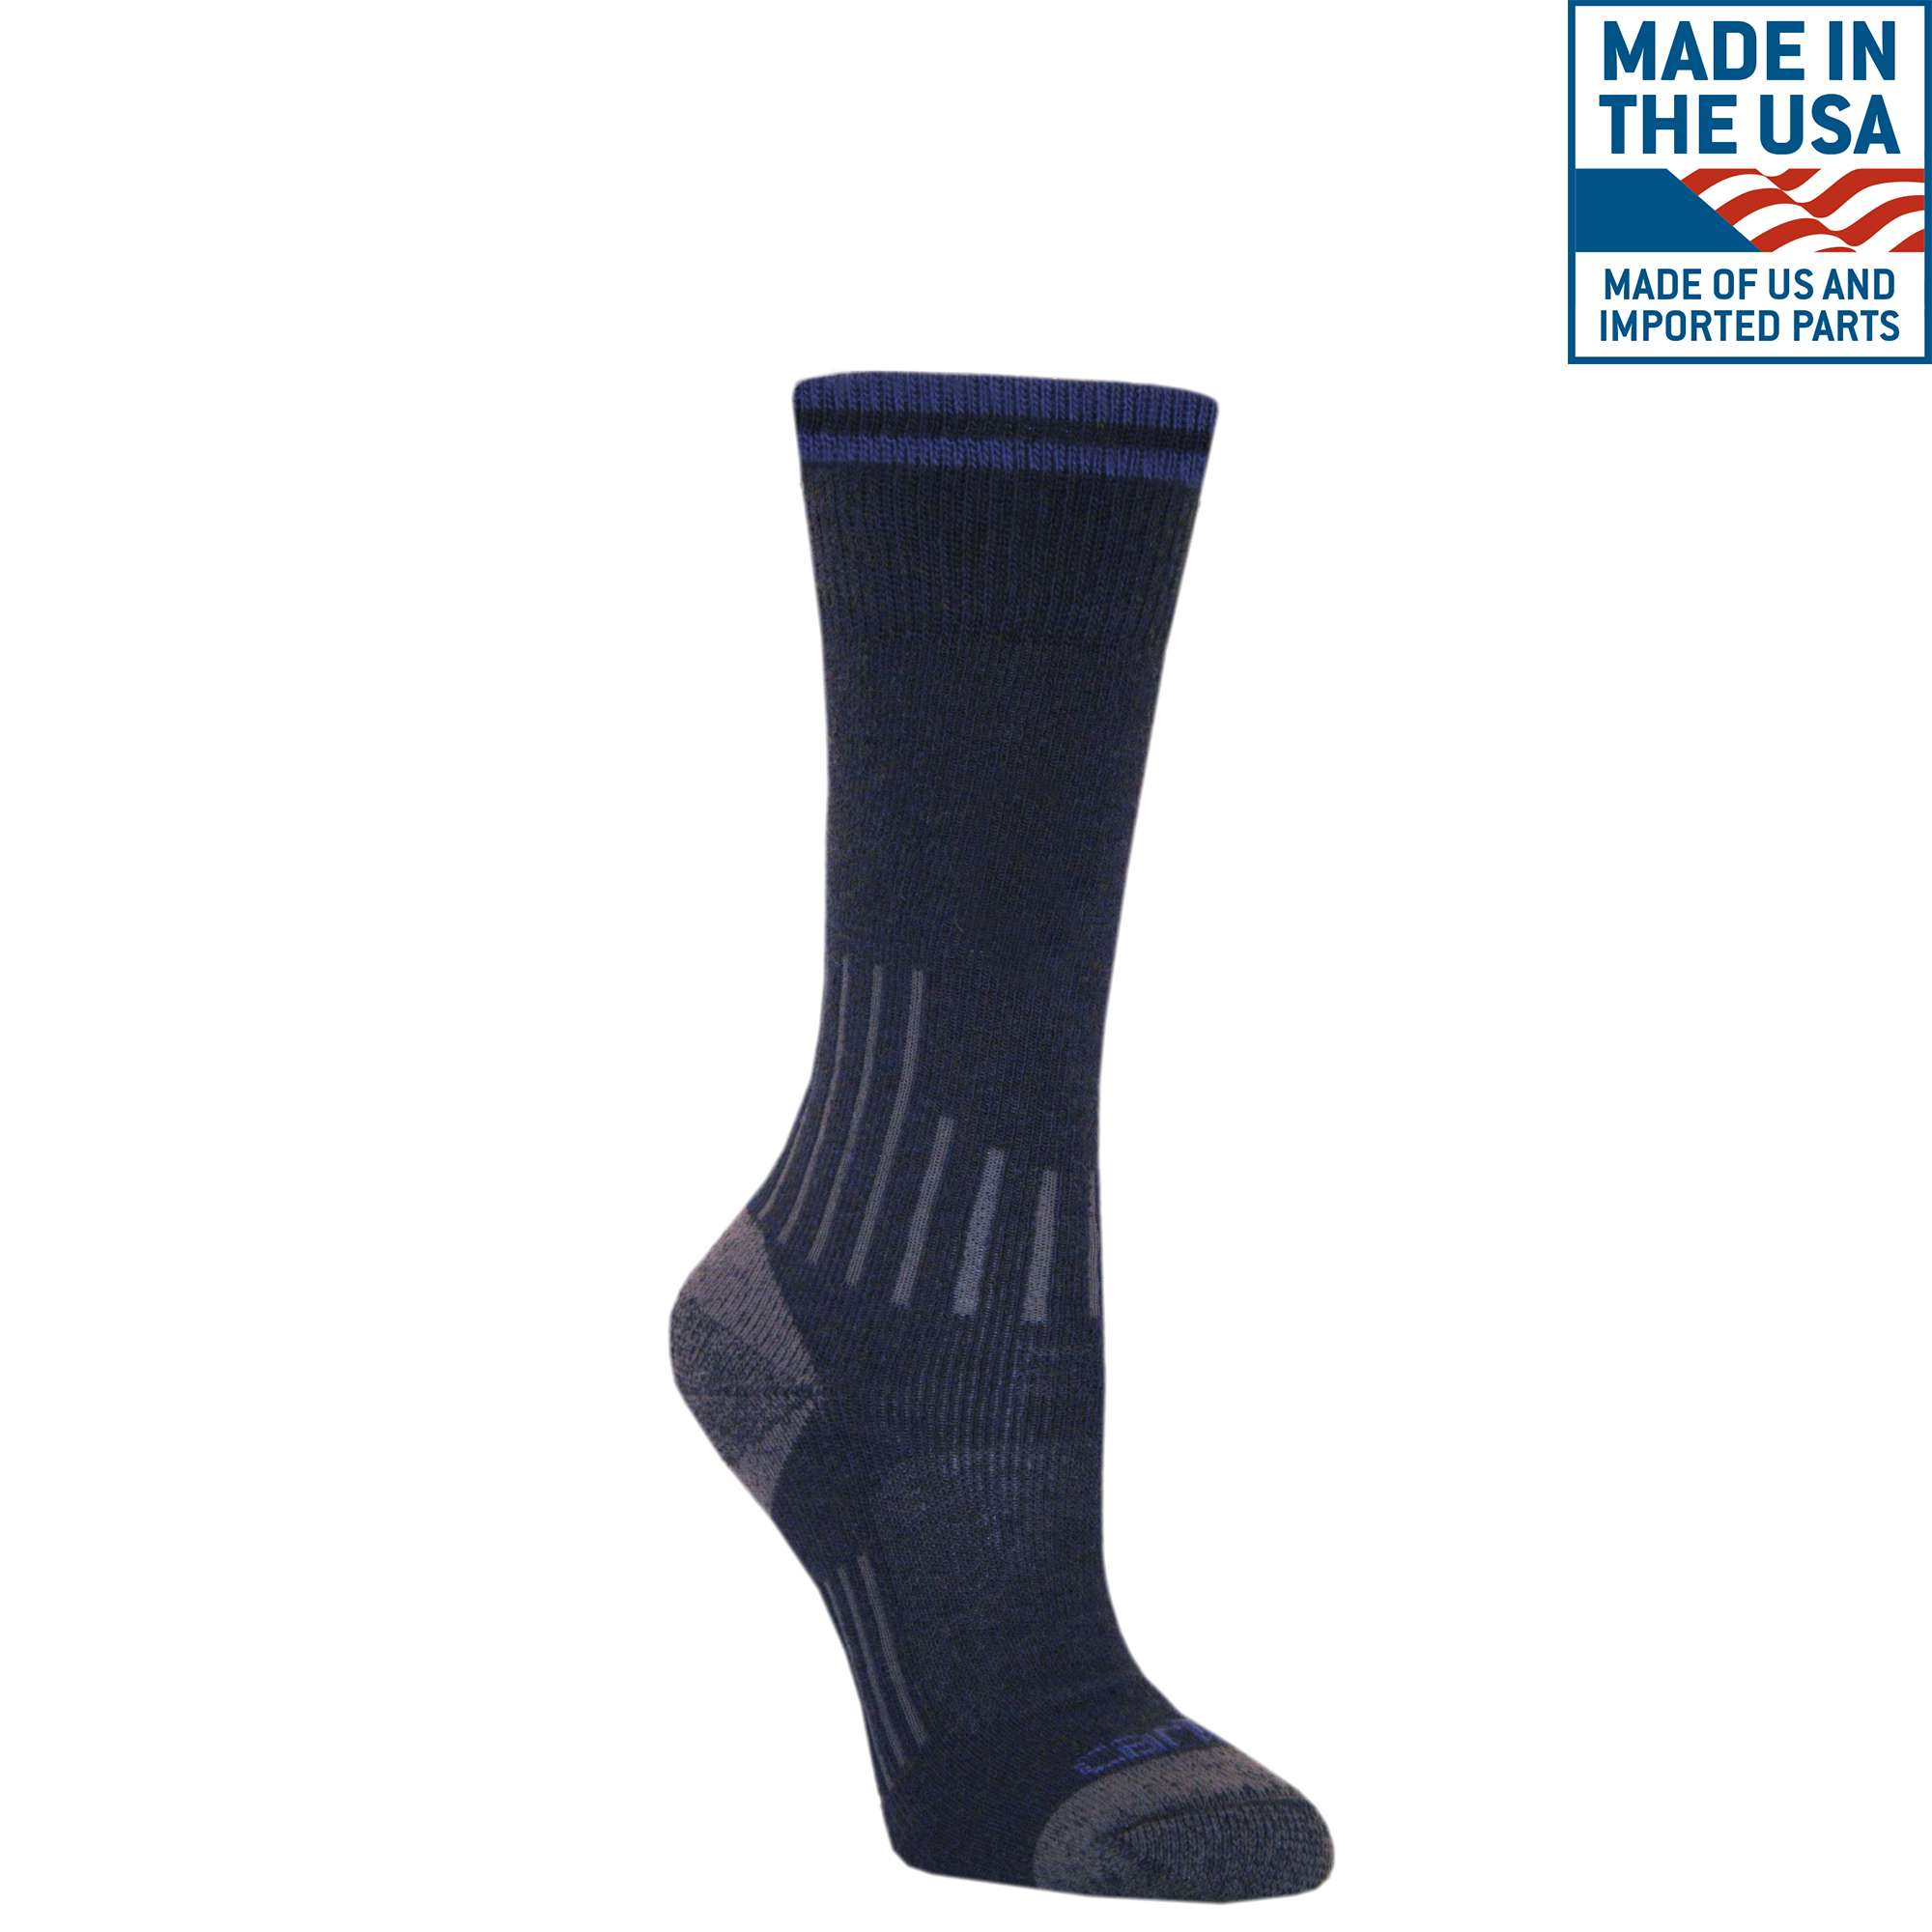 Carhartt Work-dry Merino Wool Graduated Compression Boot Sock